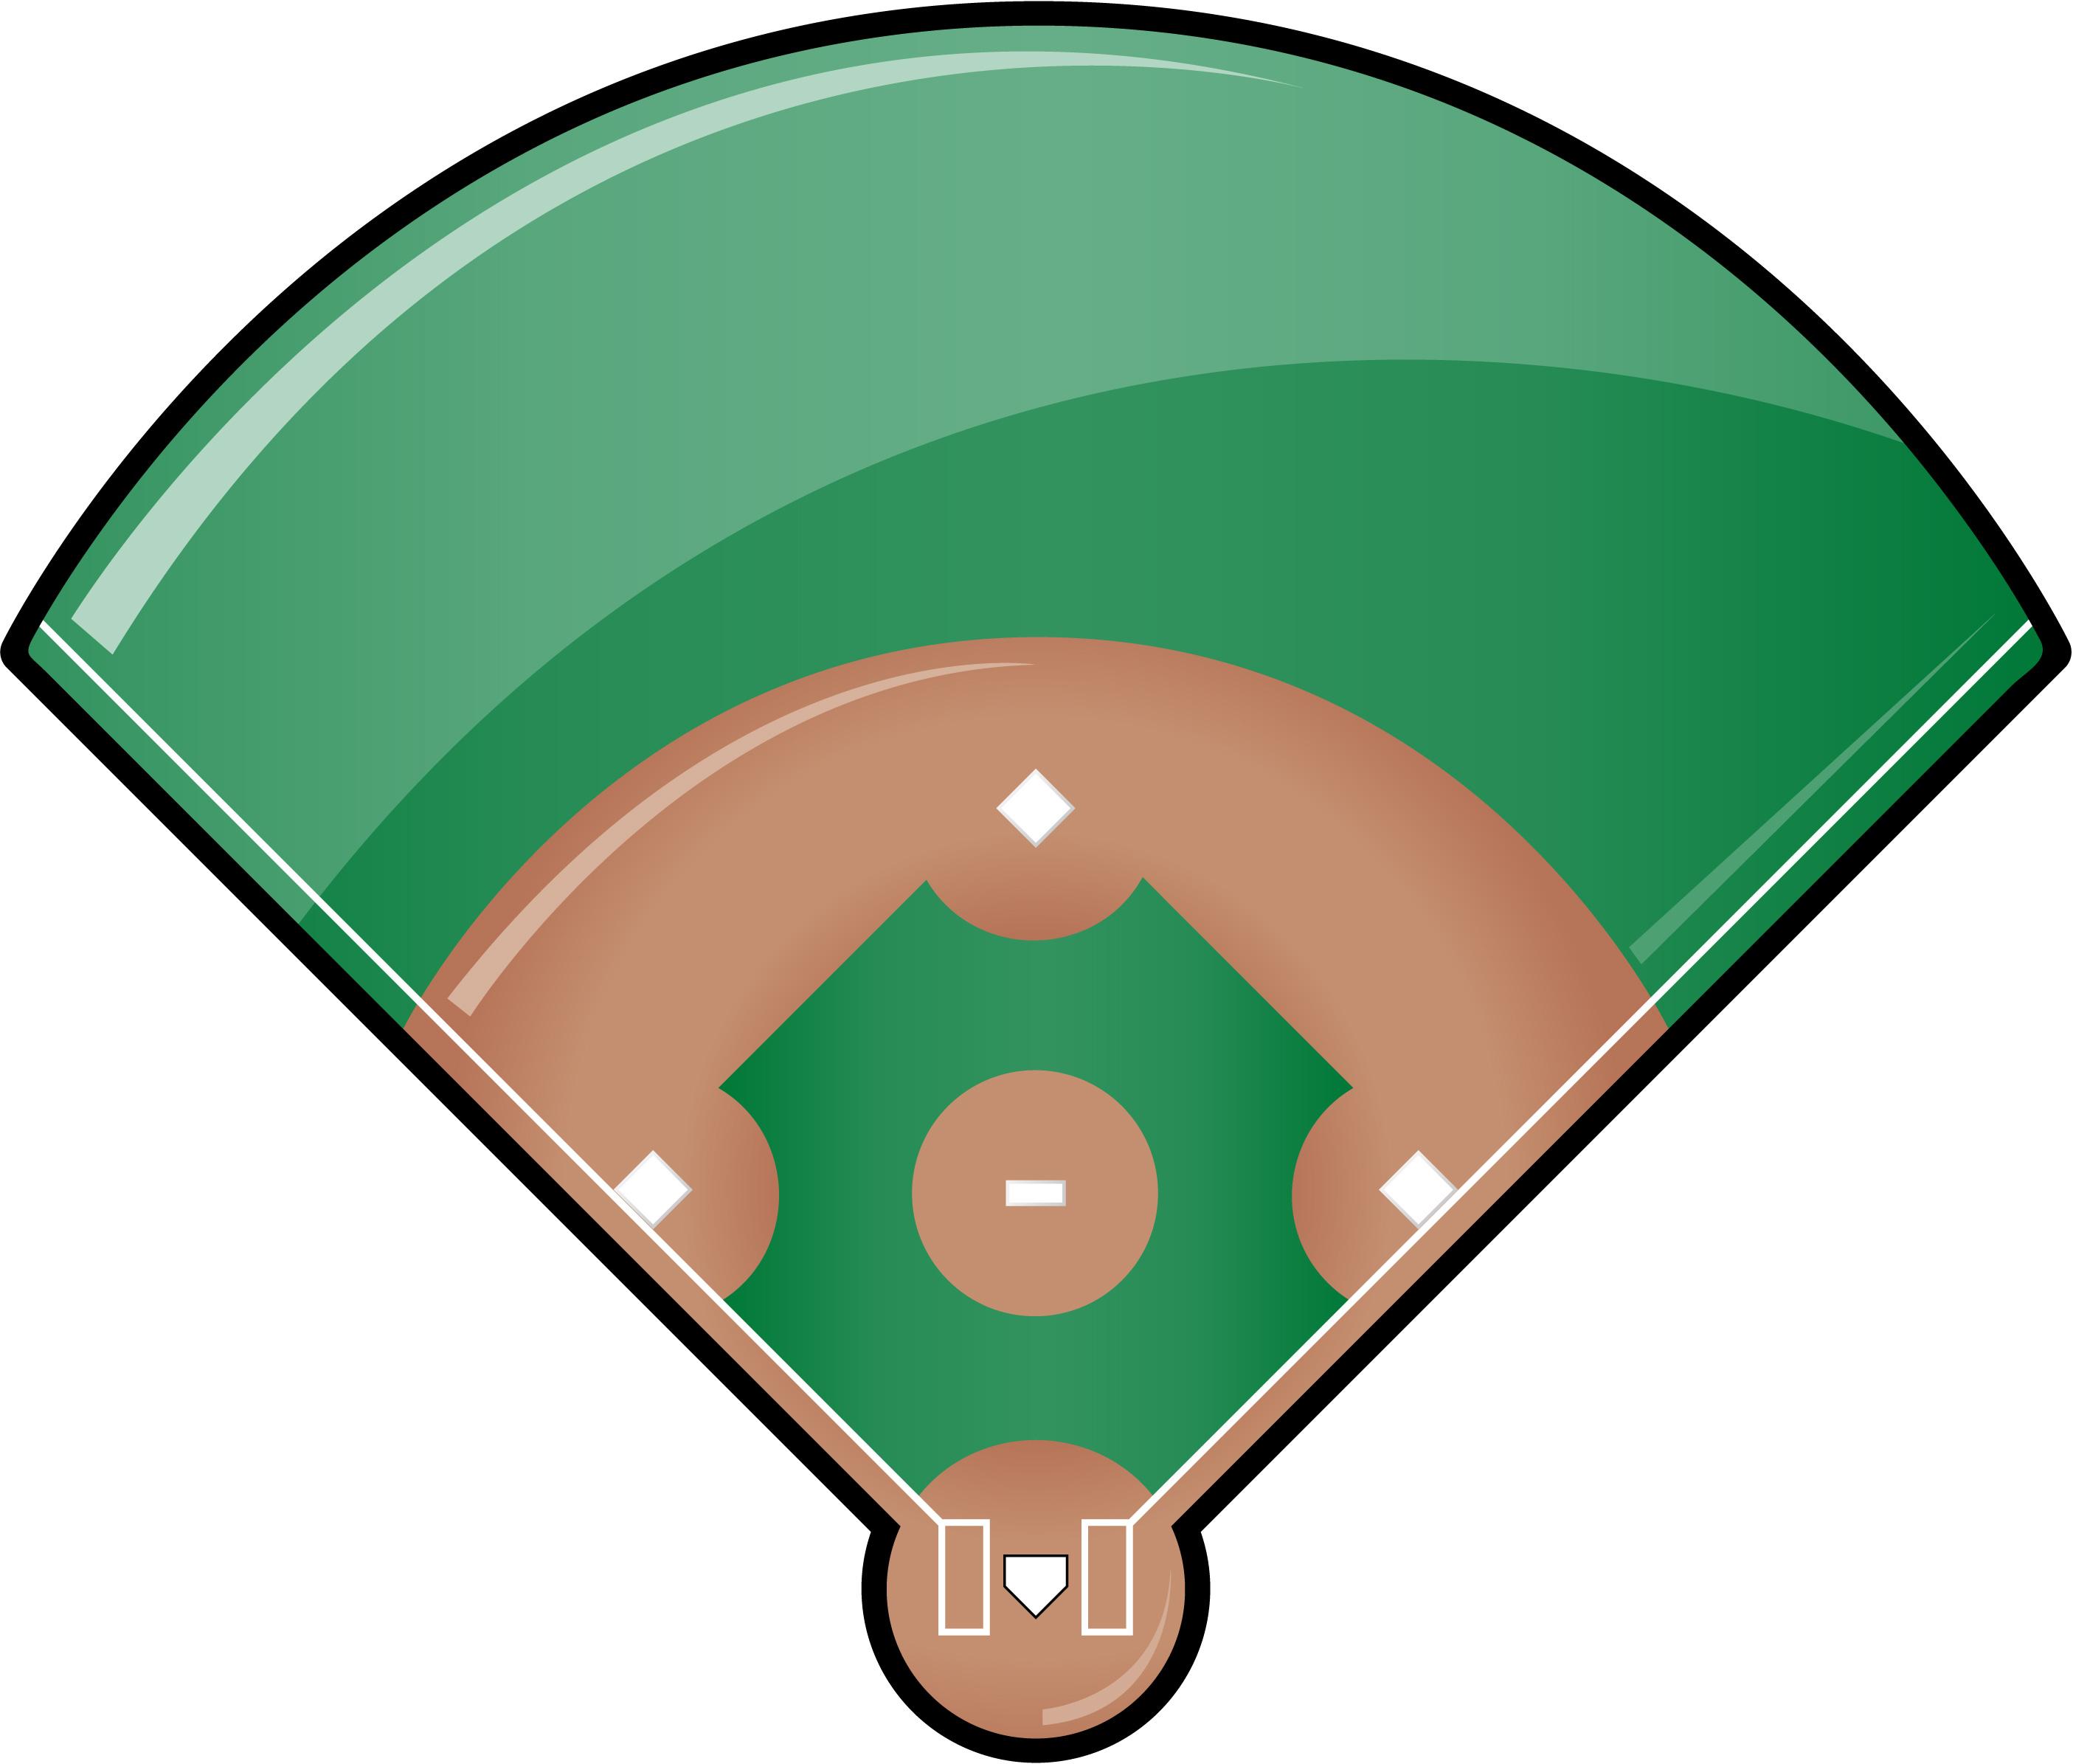 Baseball diamond baseball field clipart free images